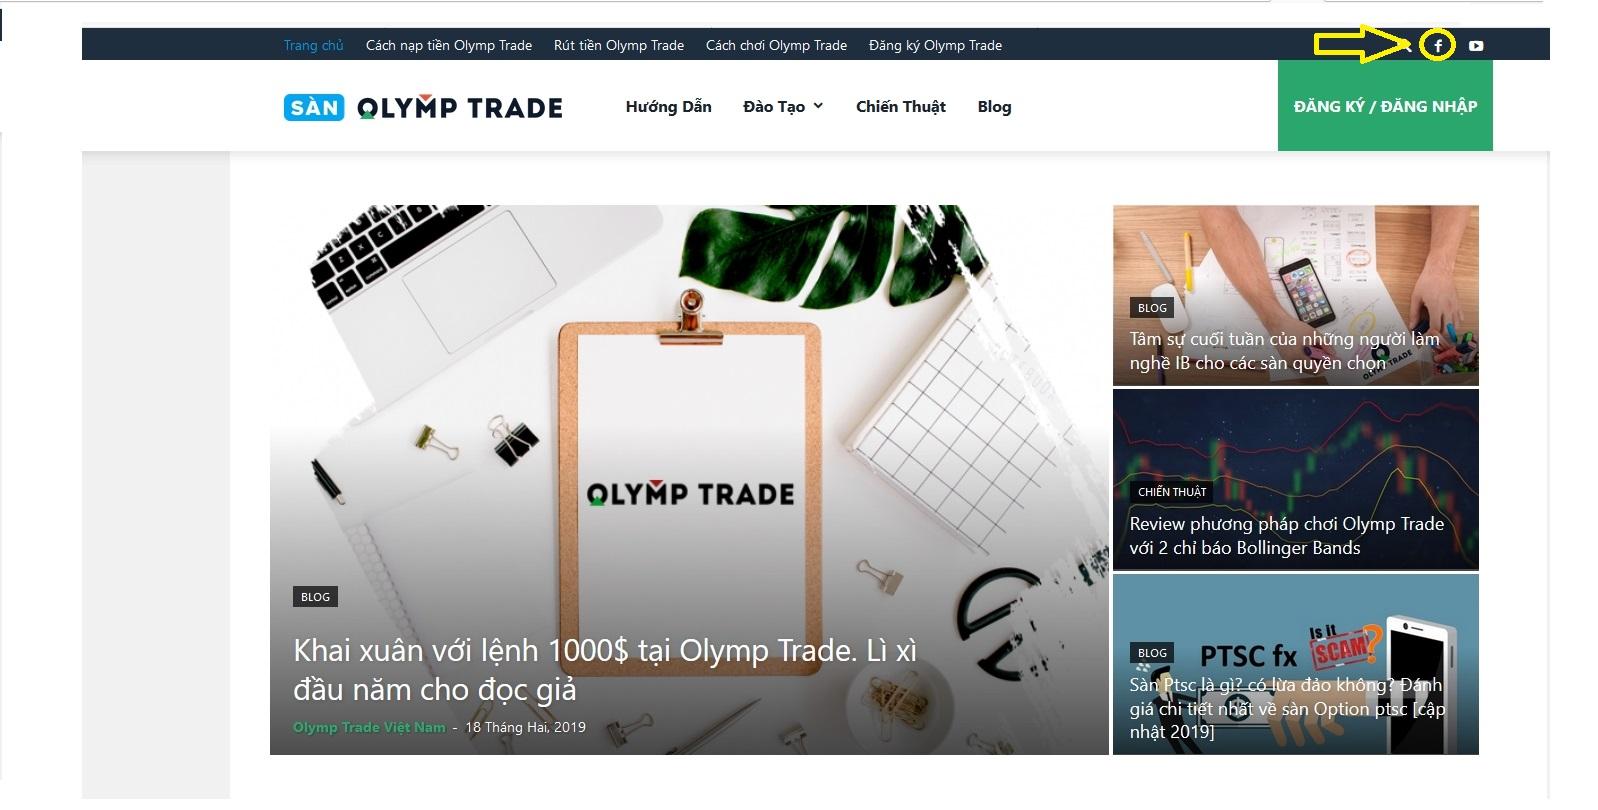 Tham gia group Olymp Trade Việt Nam